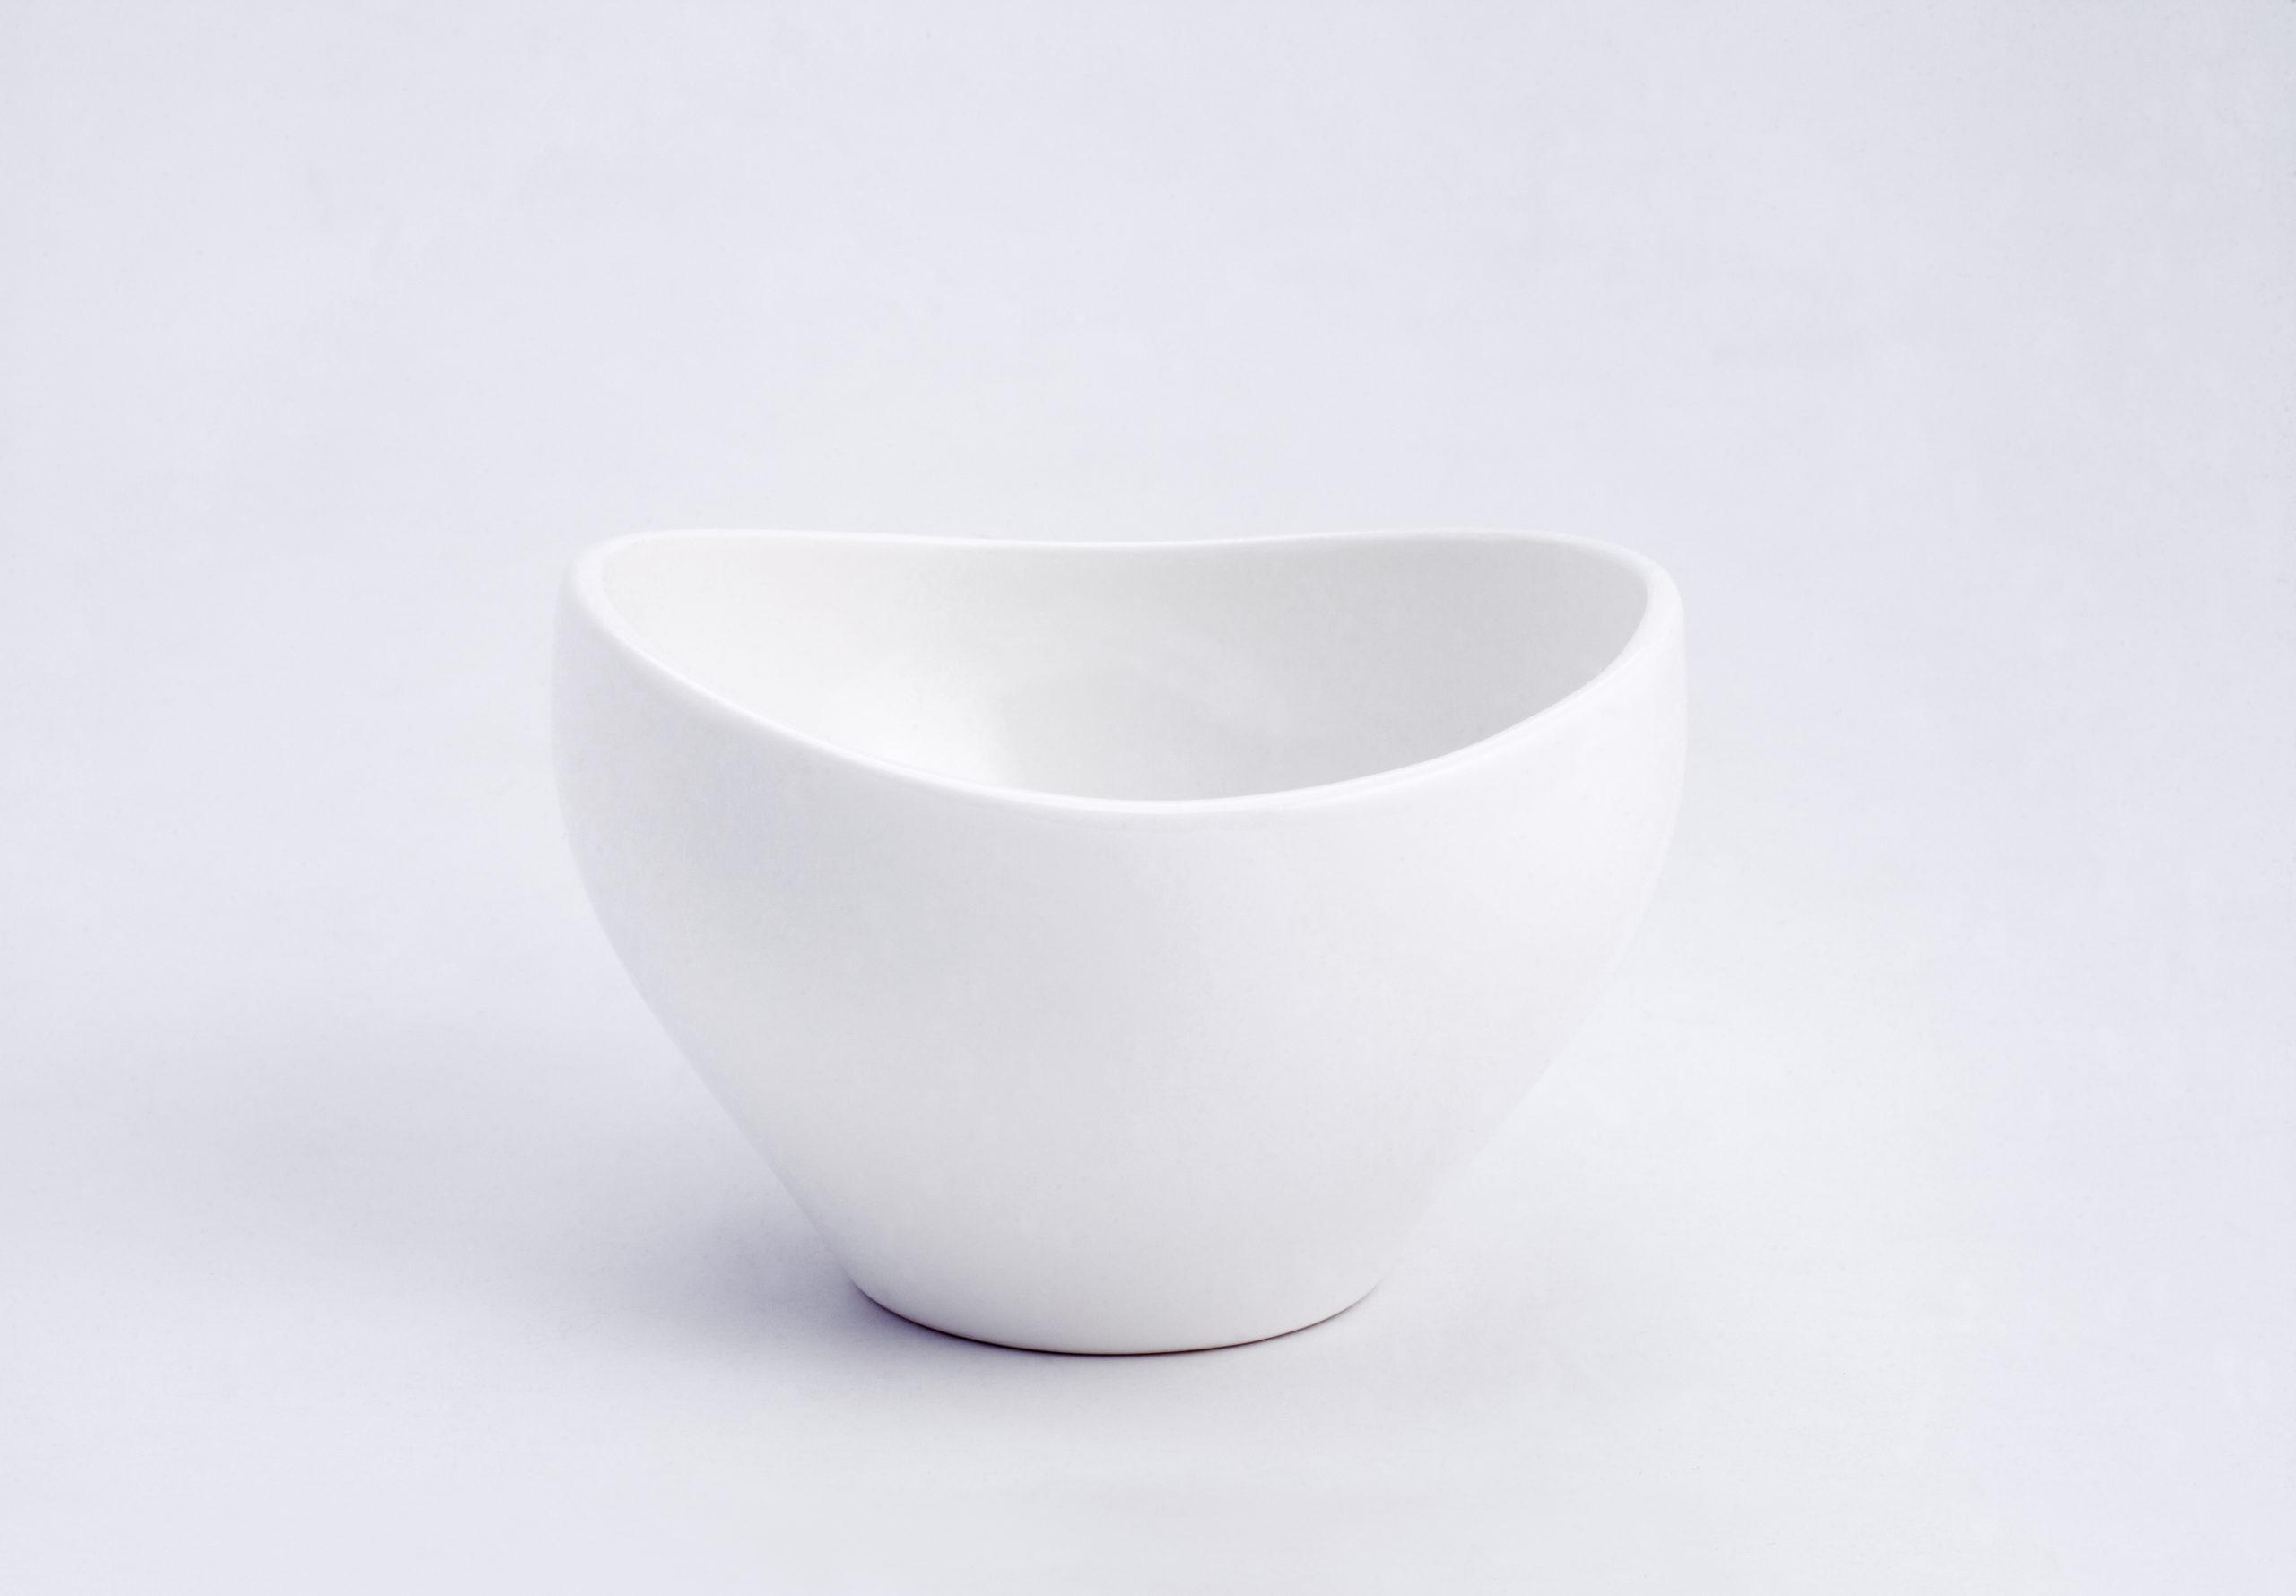 Architectmade-FJ-Essence-Sugar-Bowl-Porcelain-Finn-Juhl